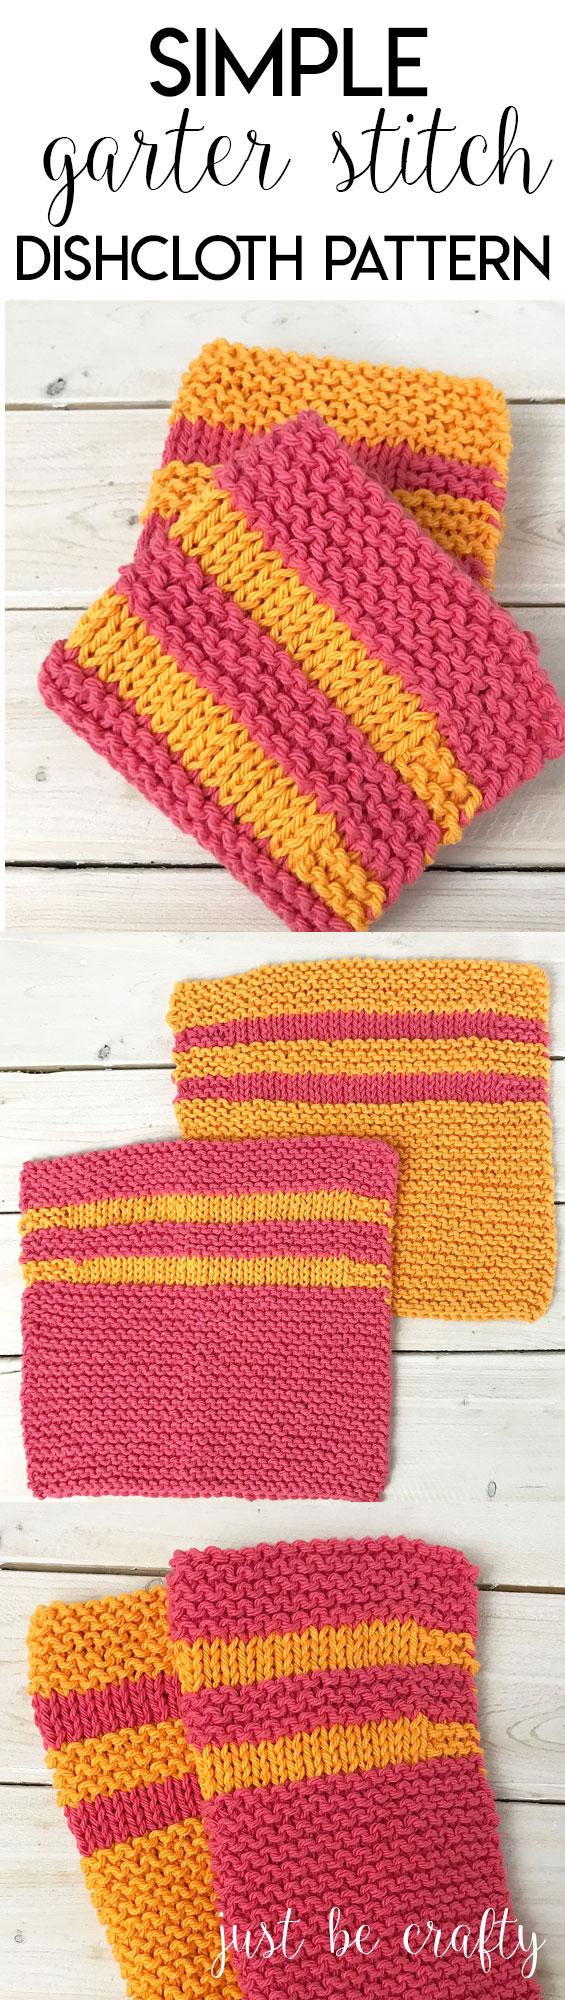 Simple Garter Stitch Dishcloth Pattern - Free Pattern by